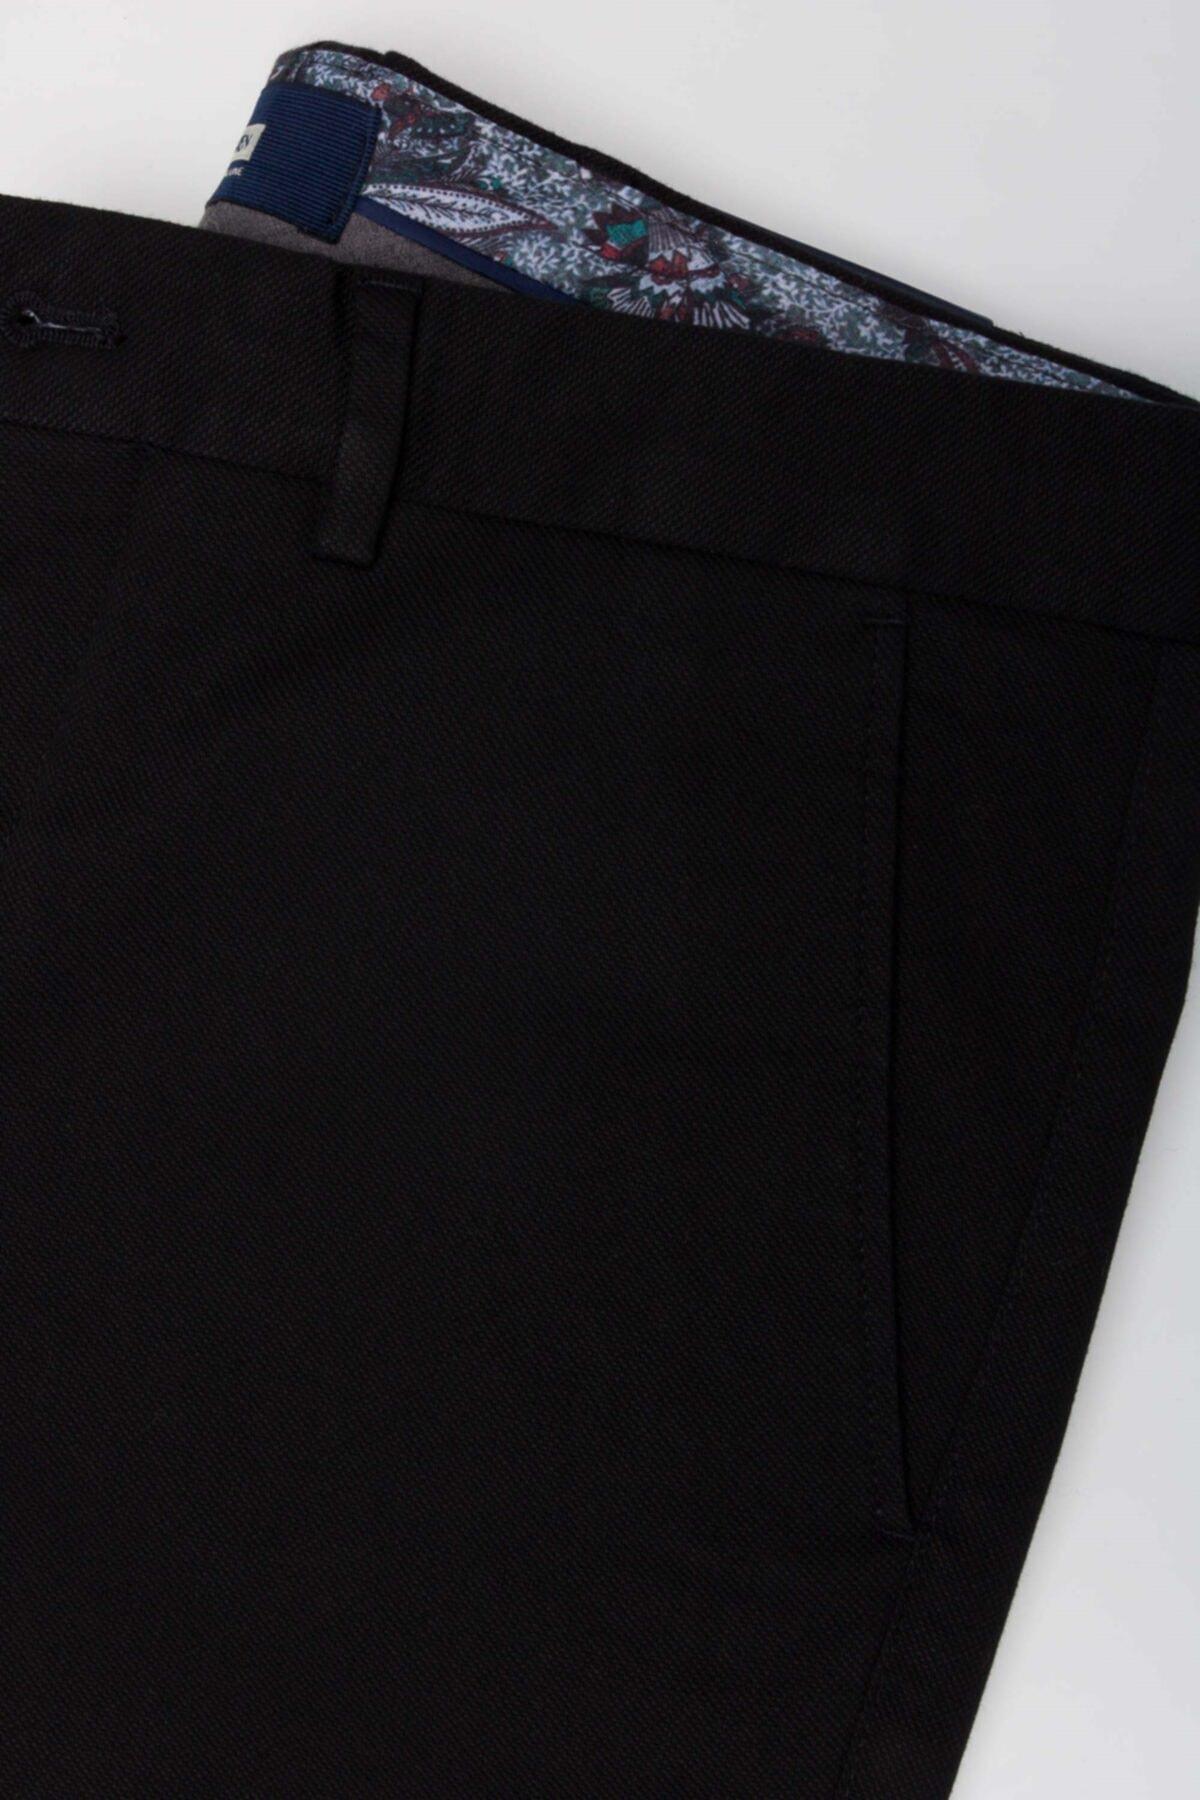 Jakamen Erkek Siyah Ekstra Slim Pantolon Jk32es12m023 2